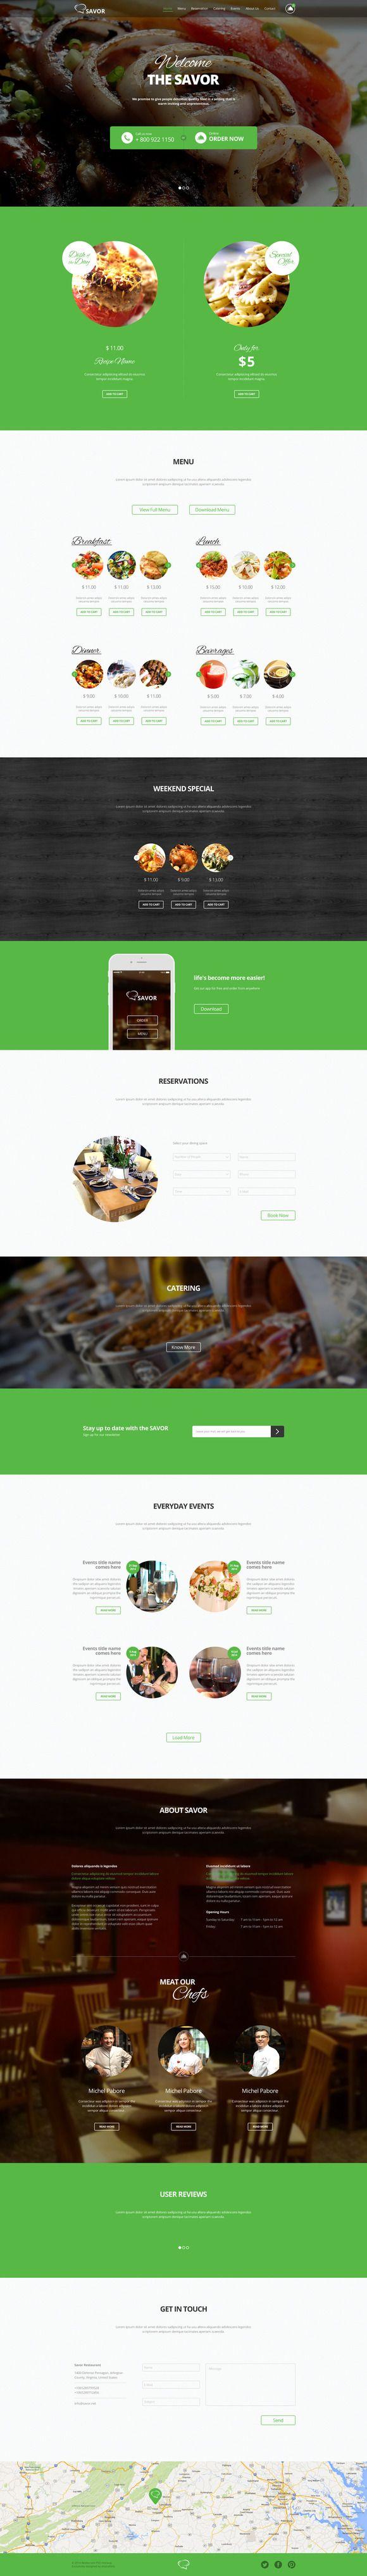 Savor-One Page Restaurant Theme by shaziafolio on @creativework247